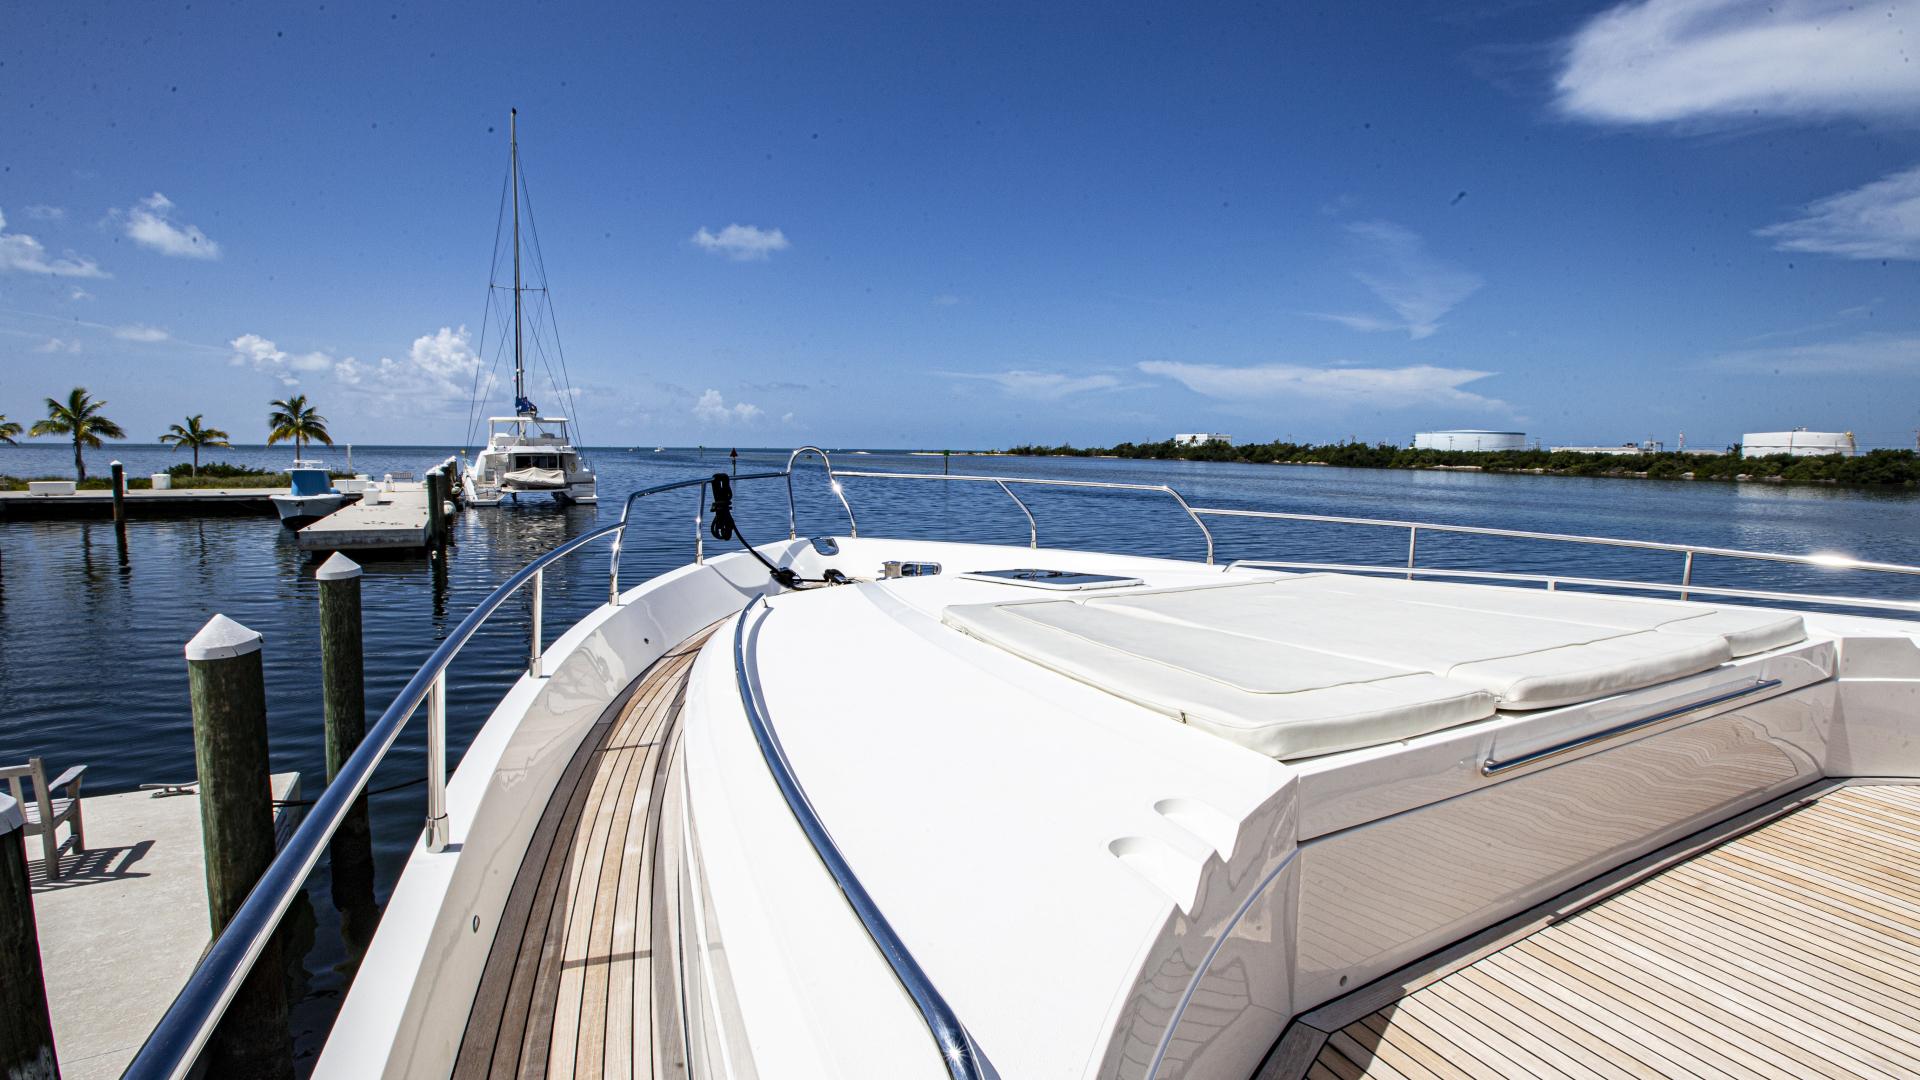 Viking Princess-V85 2009-Las Brisas Fort Lauderdale-Florida-United States-1365525 | Thumbnail